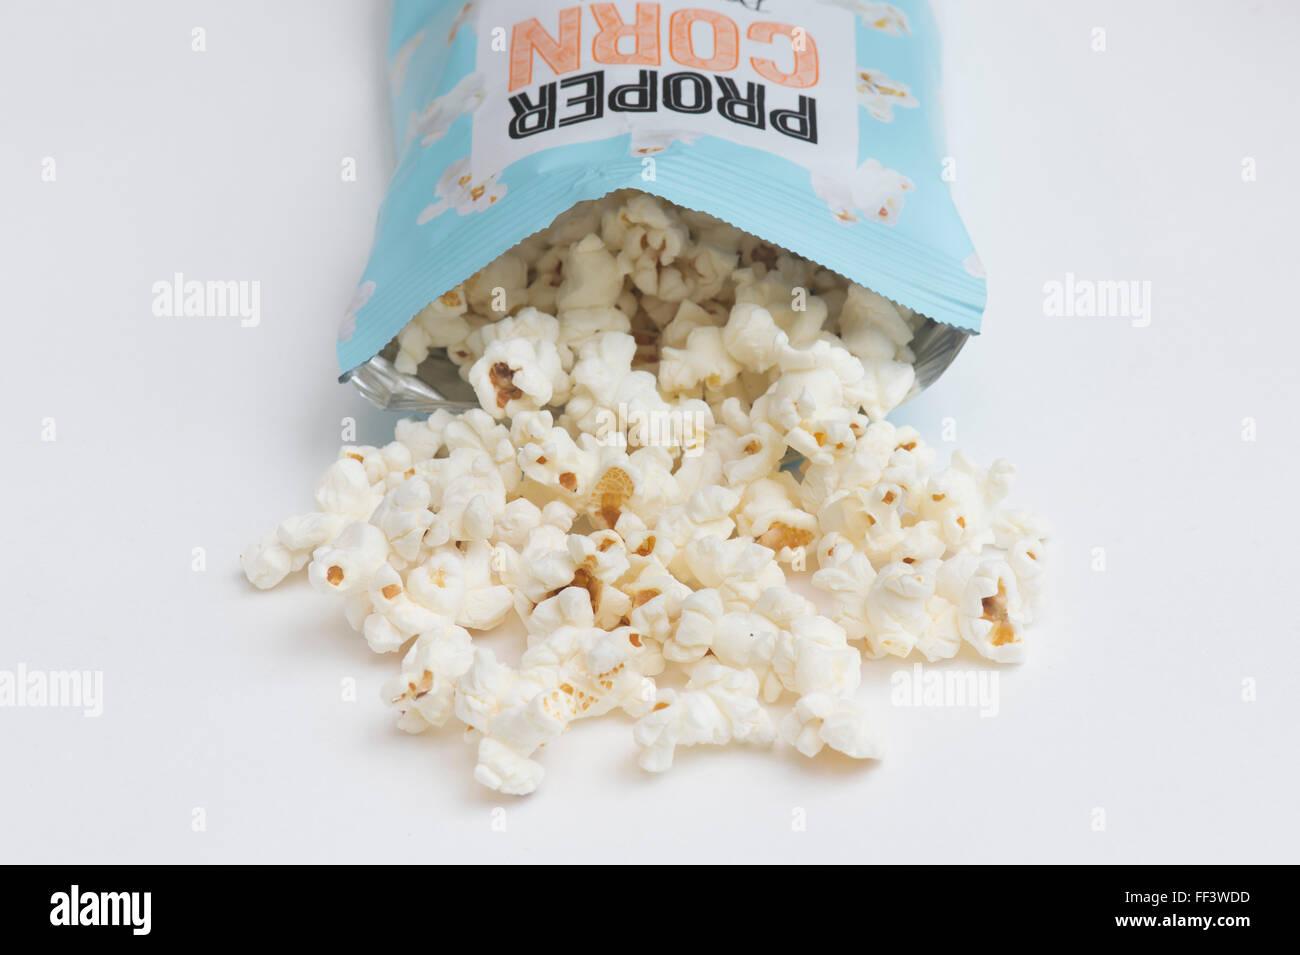 Propercorn flavored popcorn - Stock Image